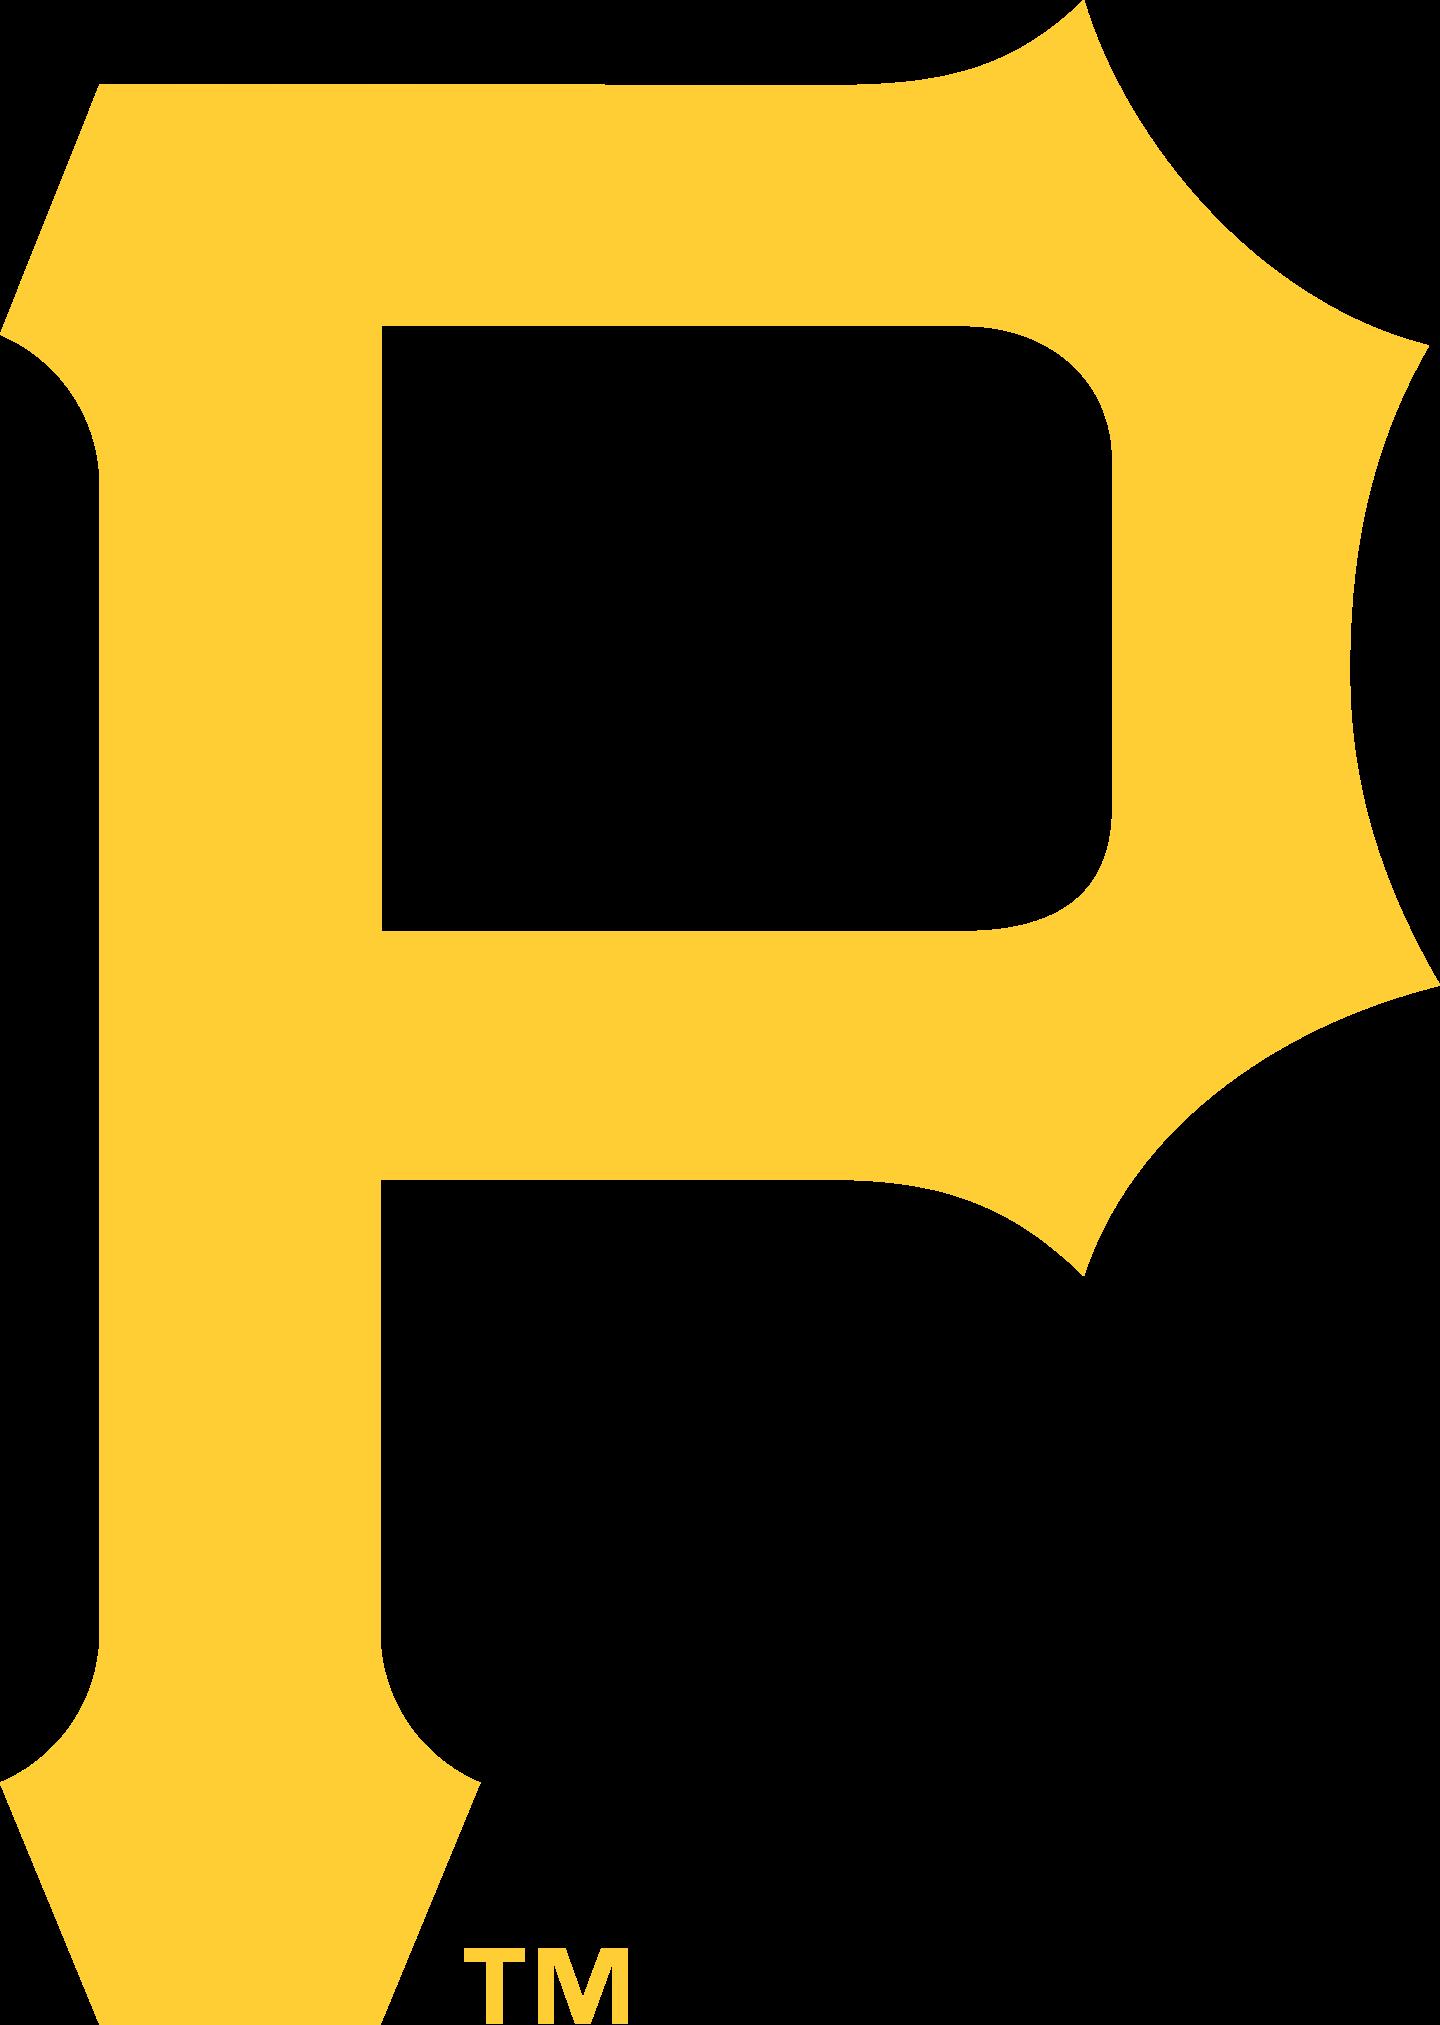 pittsburgh pirates logo 3 - Pittsburgh Pirates Logo